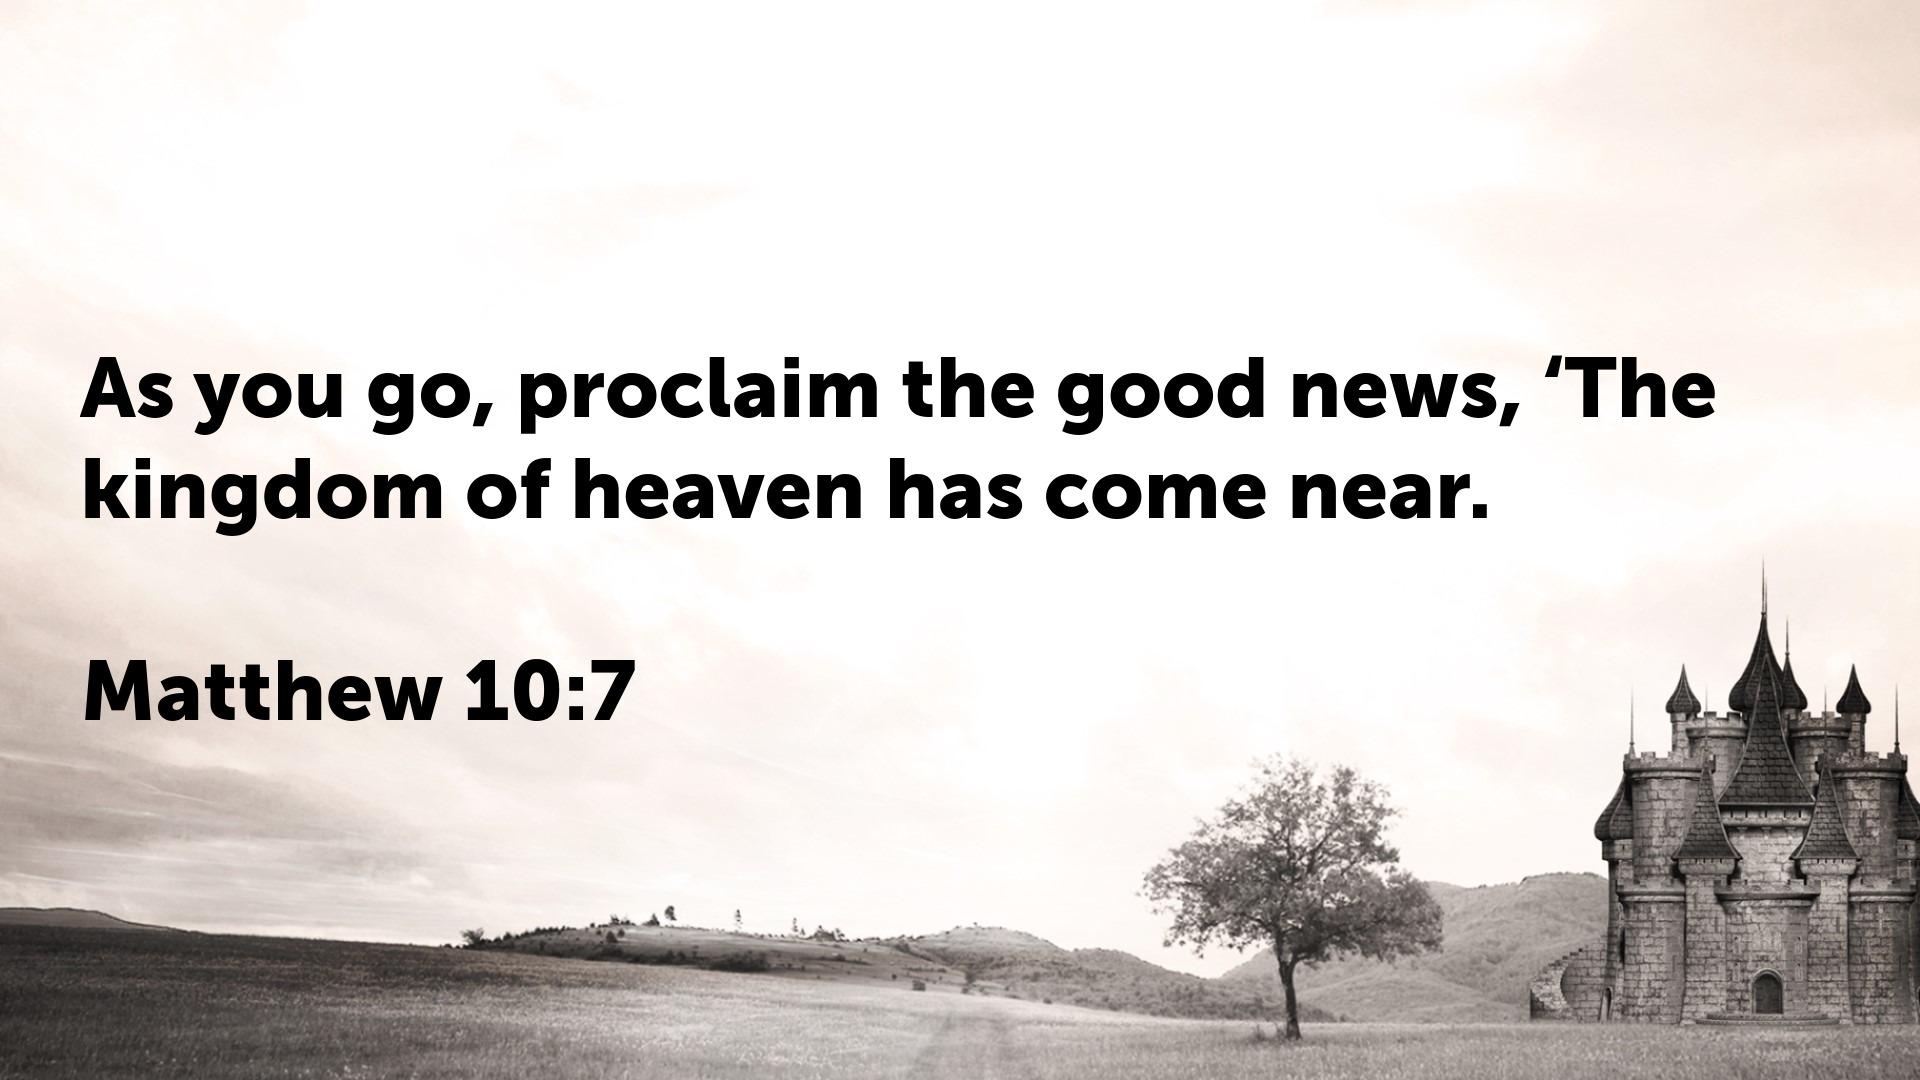 Matthew 10.7